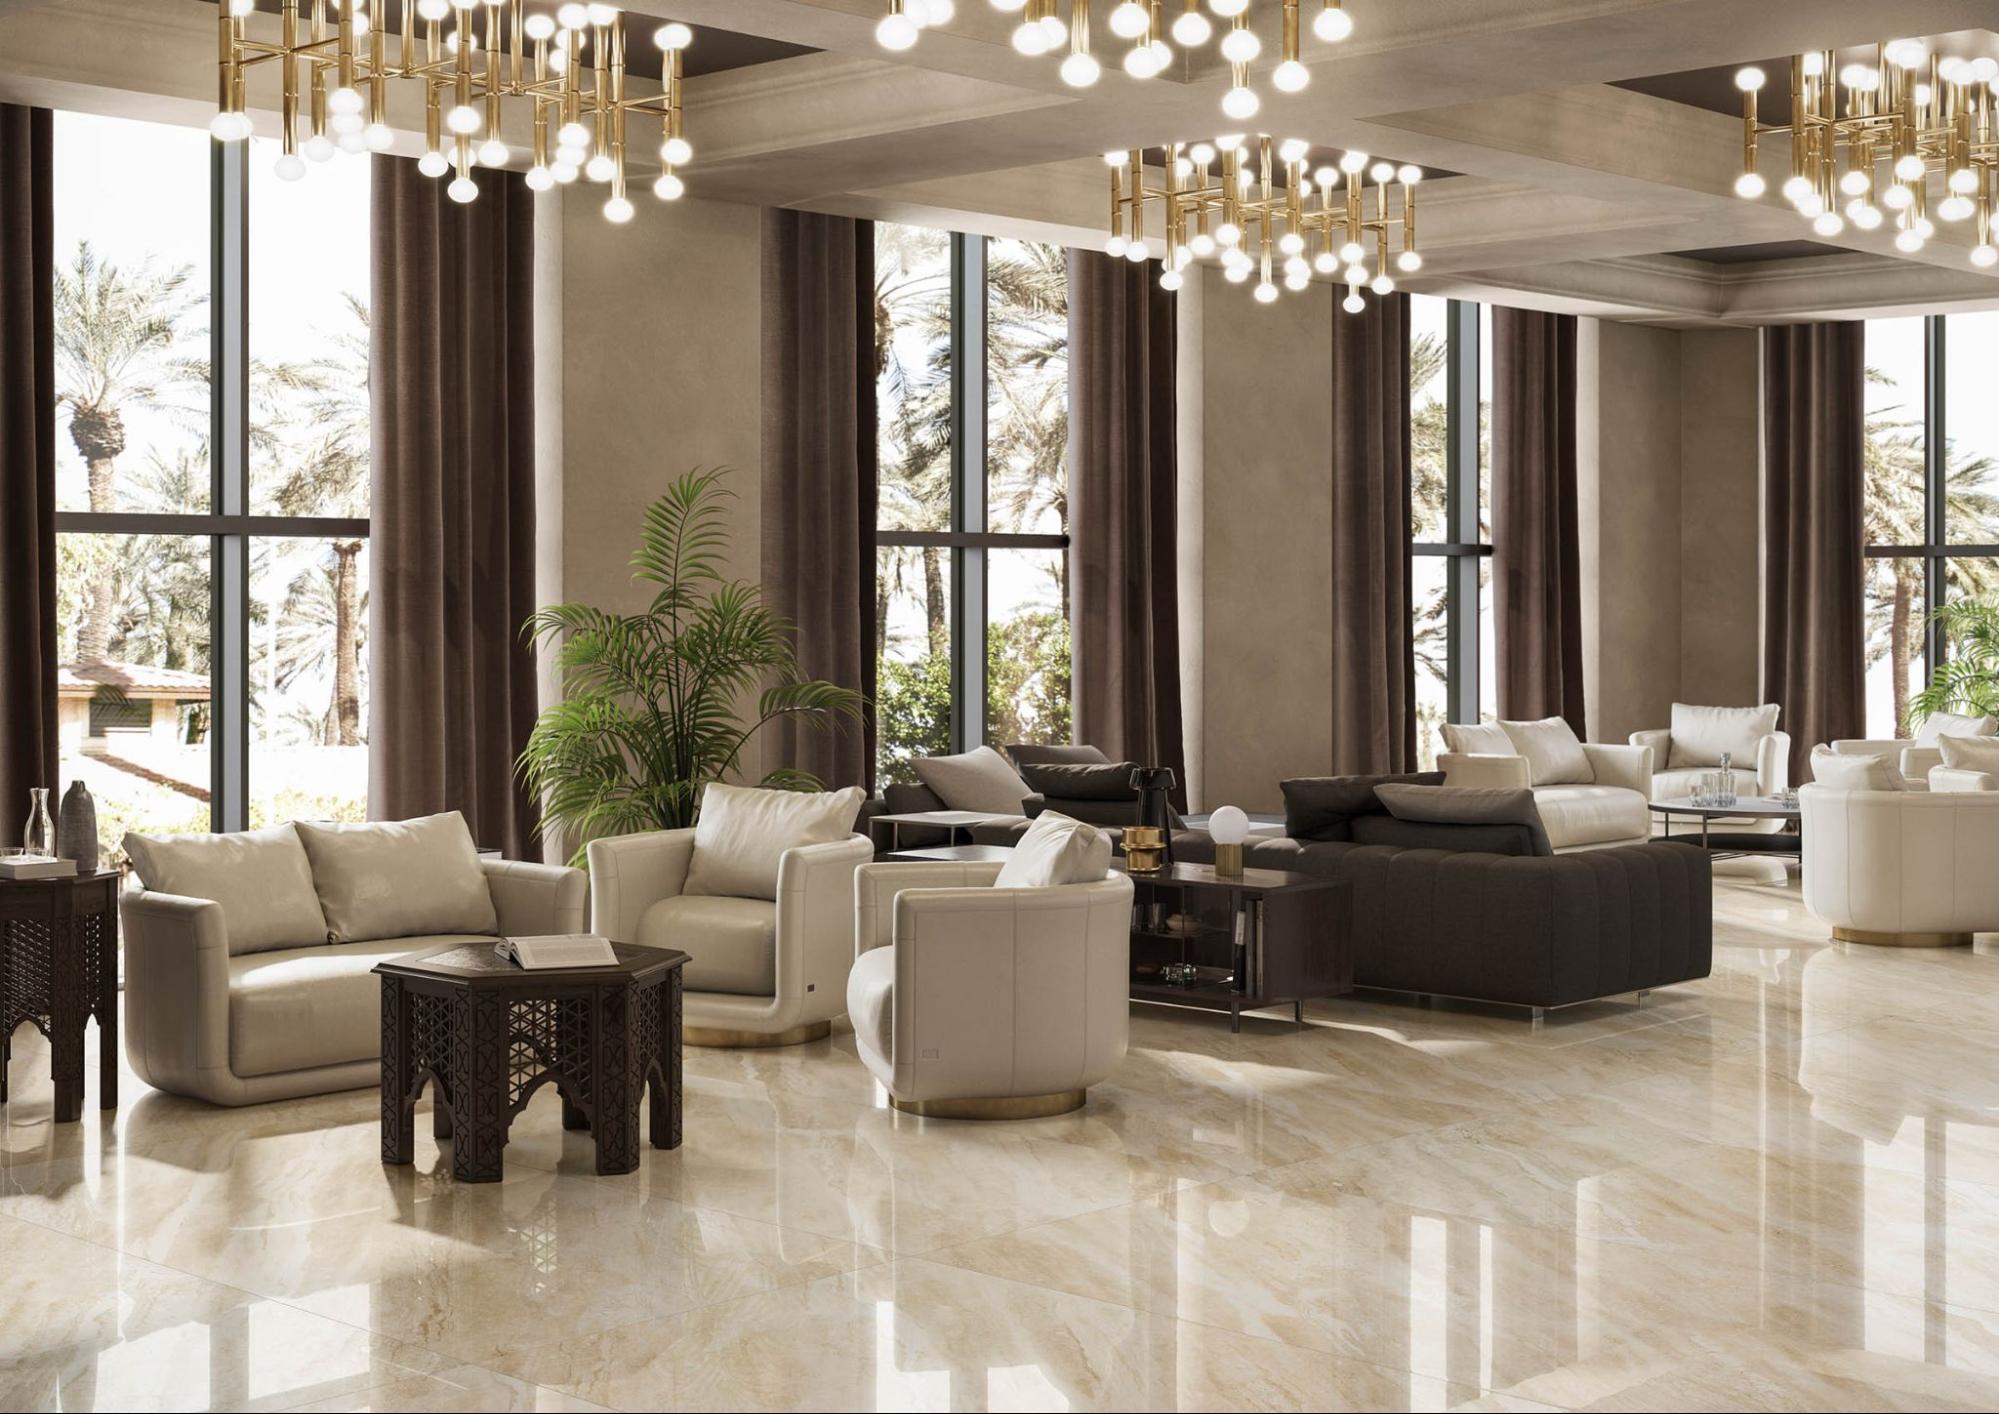 Breccia Marble Tiles In Living Room